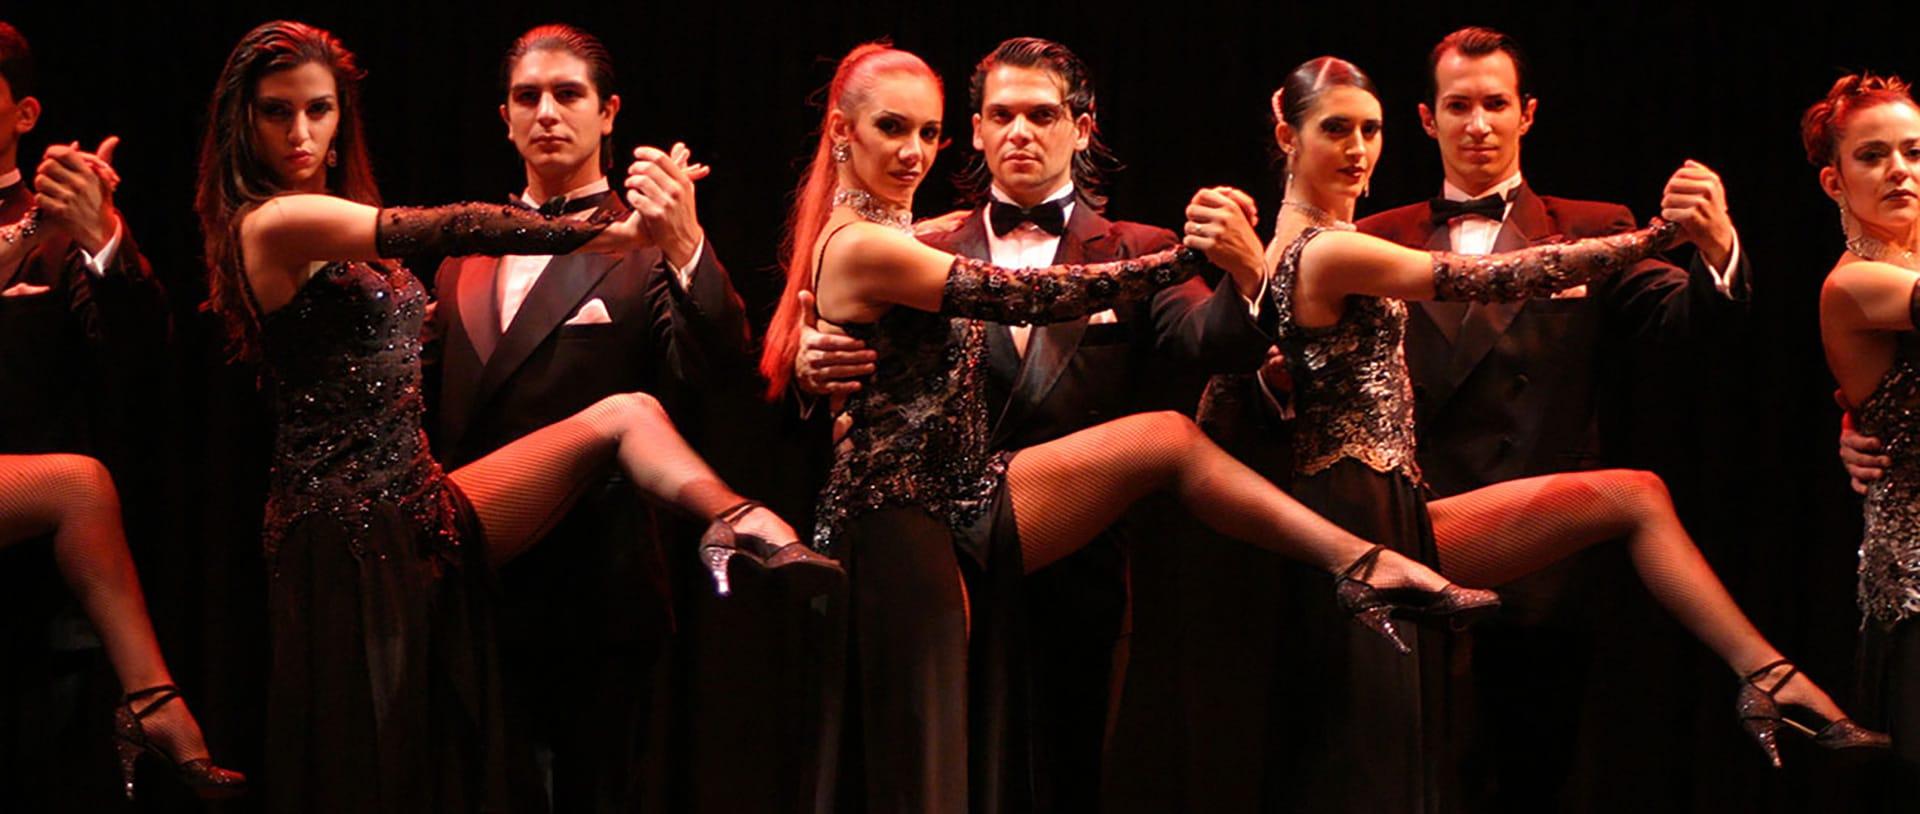 argentine buenos aires capitale stage show tango argentin cours particuliers danse culture locale patrimoine couples